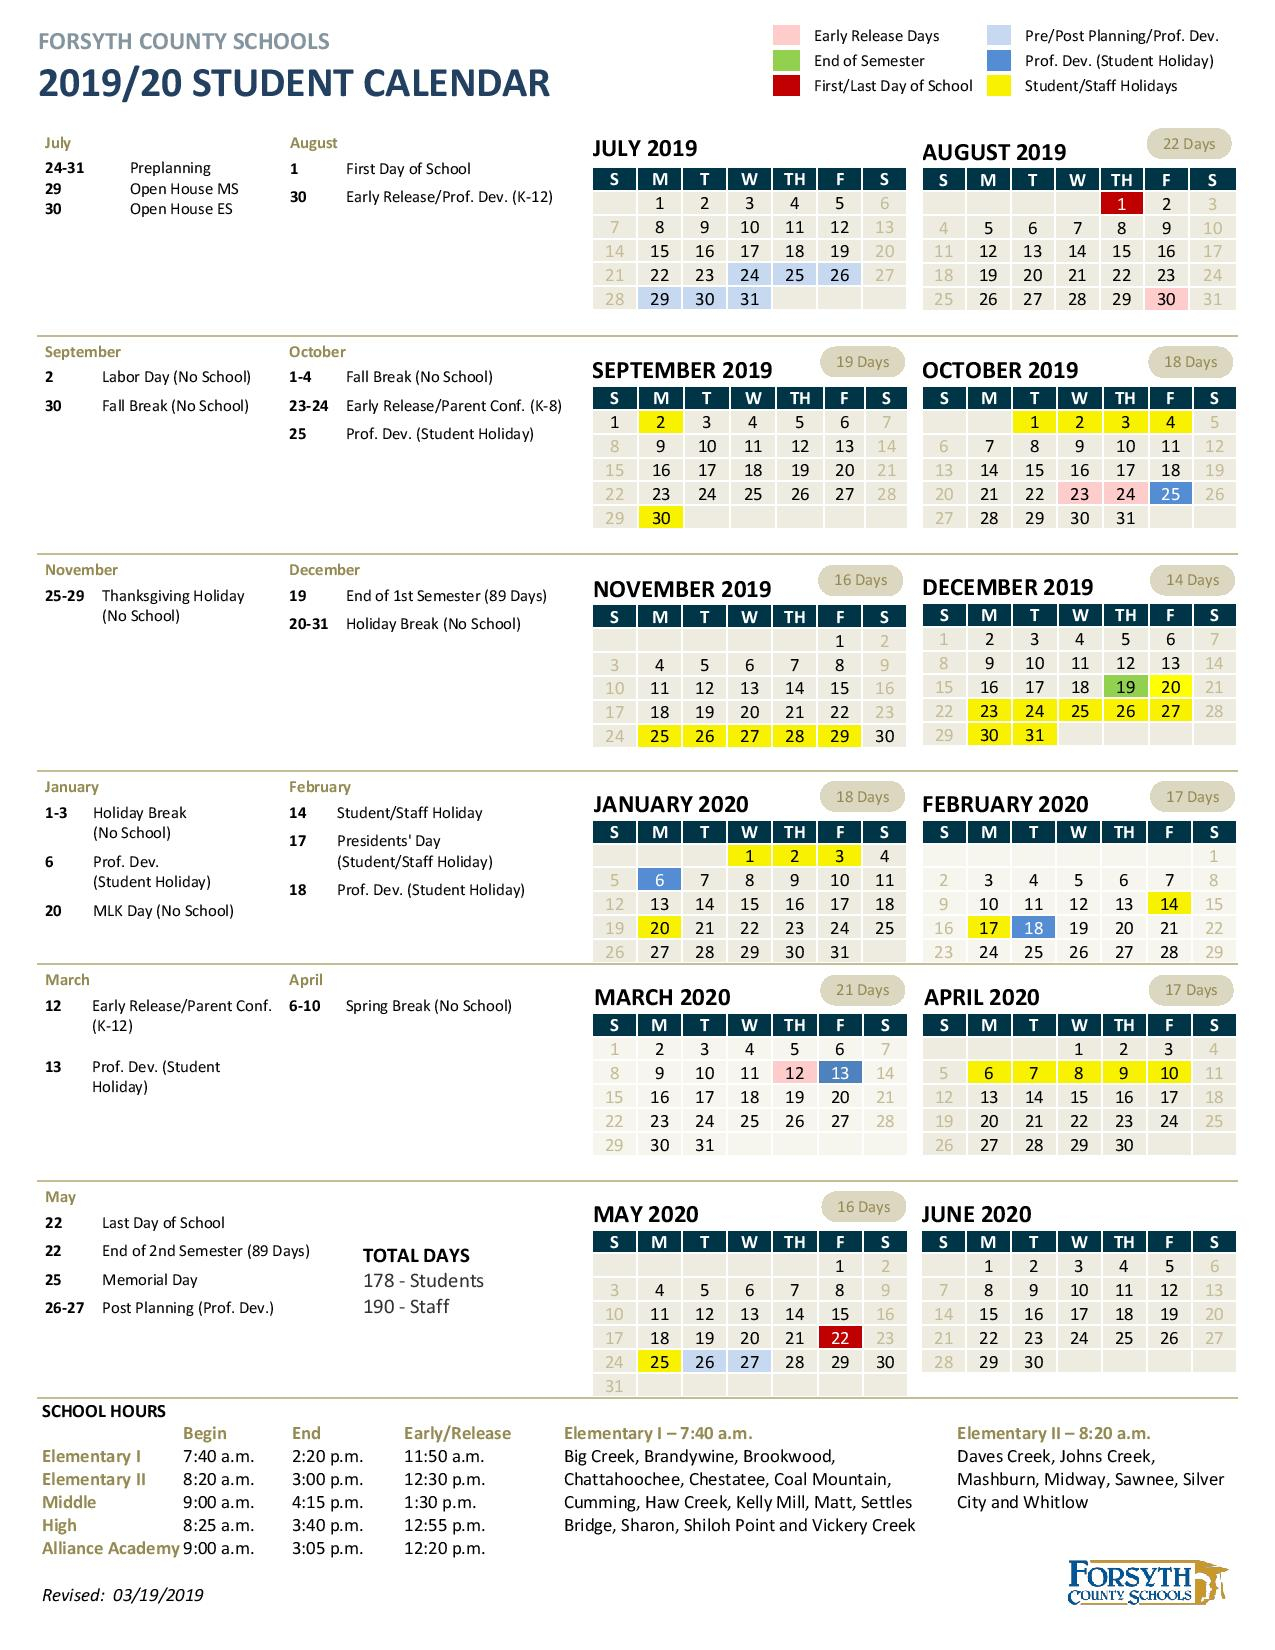 Forsyth County School Calendar 2020 | Free Printable Calendar In Winston Salem Forsyth County Schools Calendar Pdf